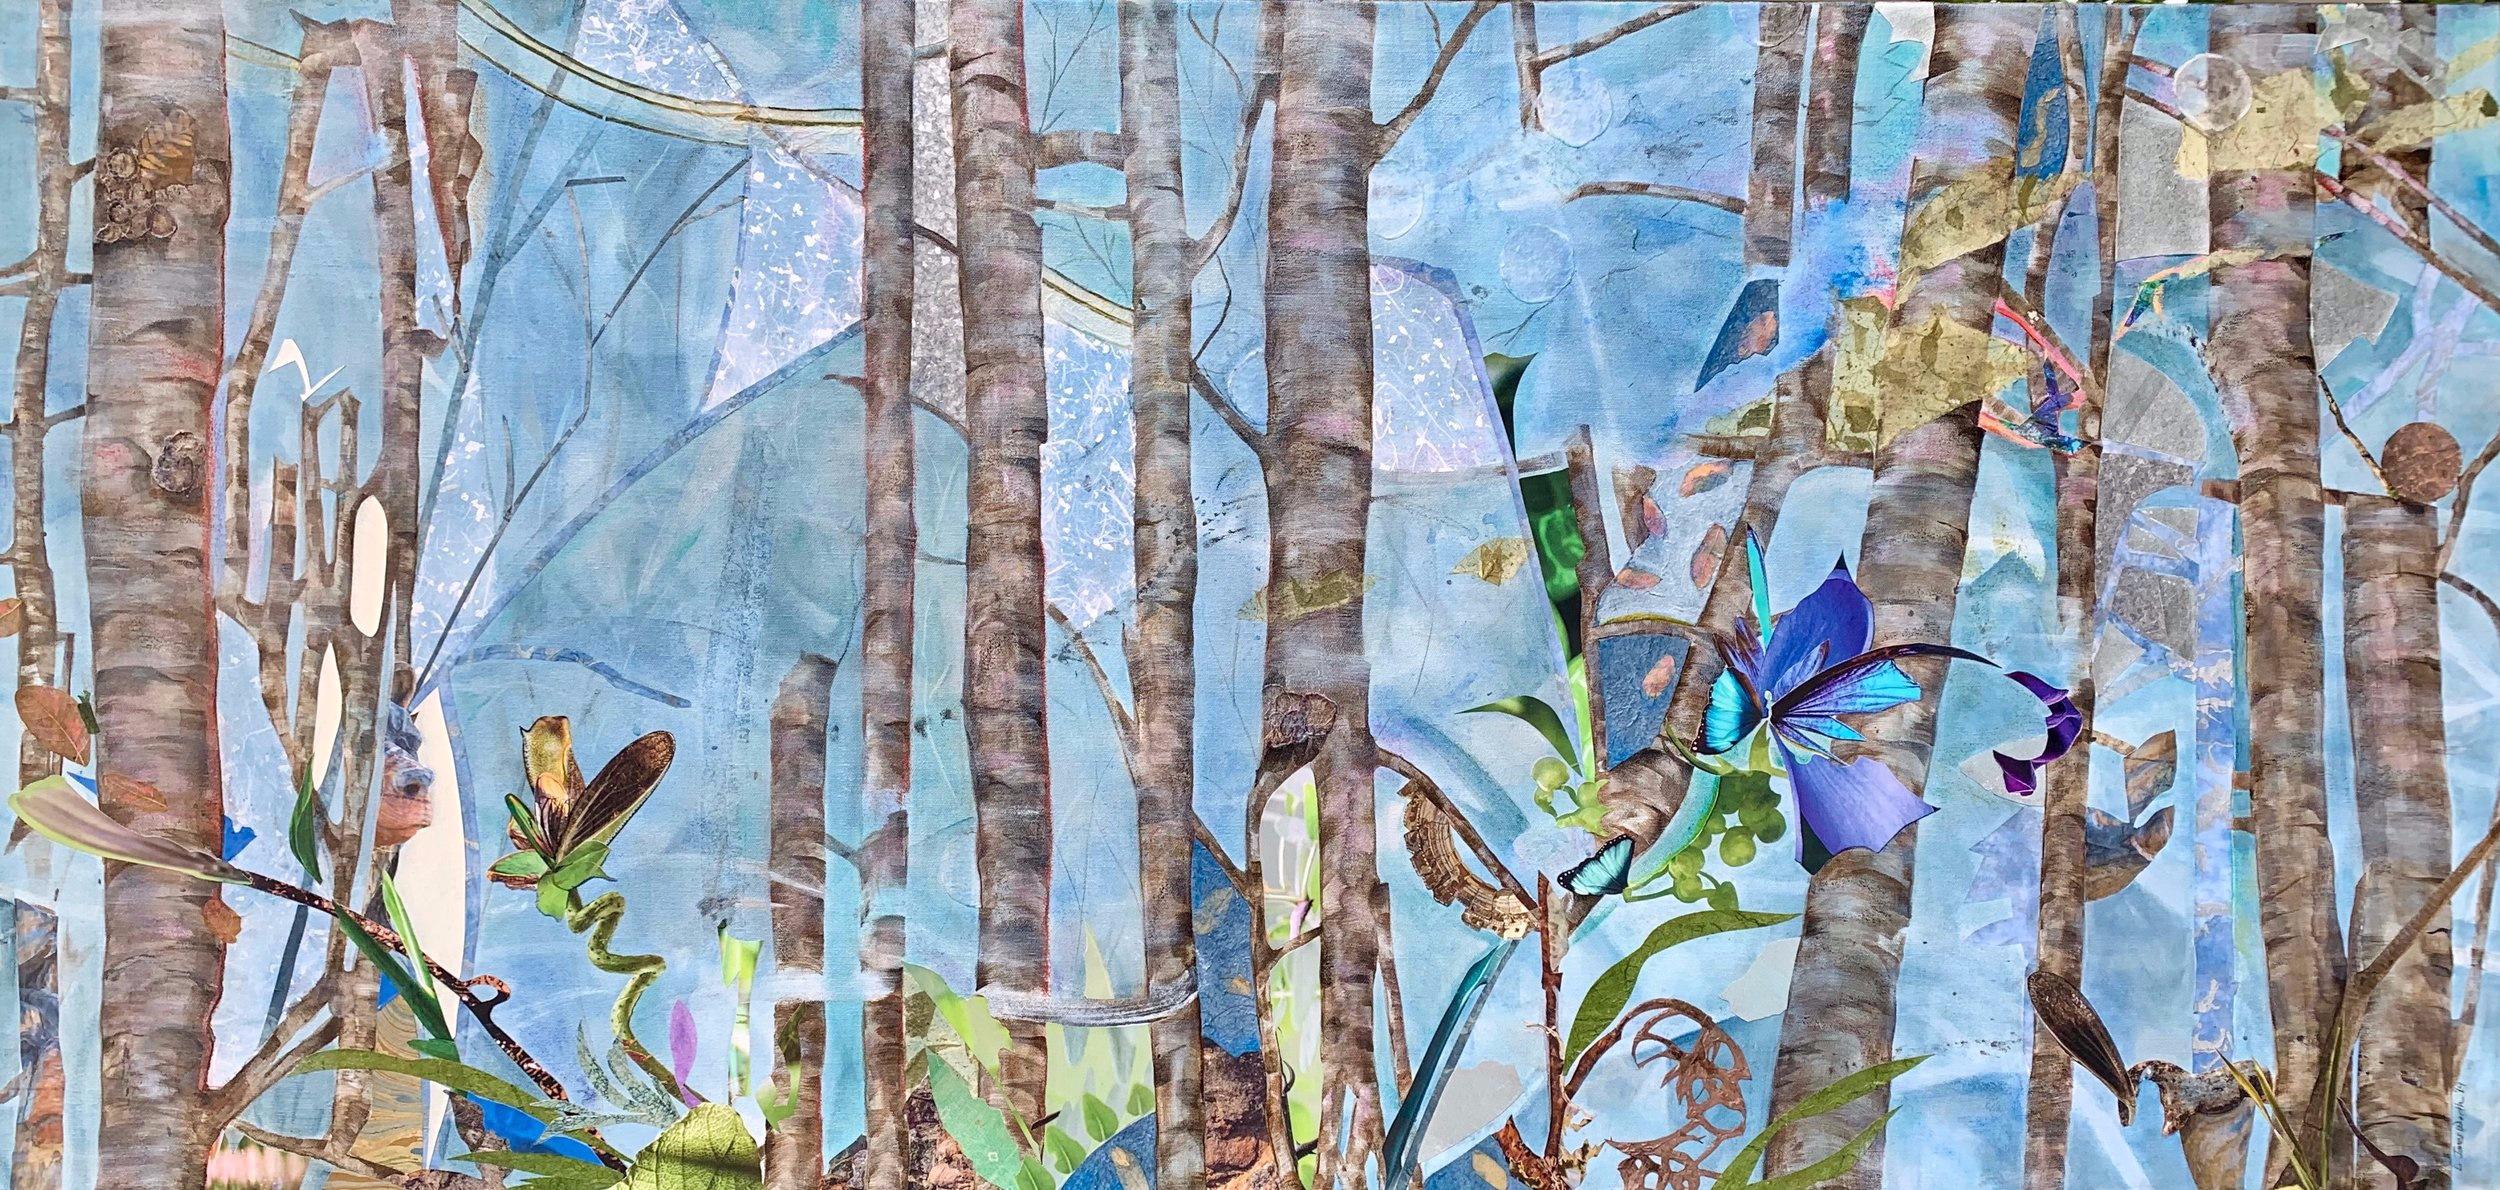 TREE SPIRITS IV, 26x54, mixed on canvas (2019)